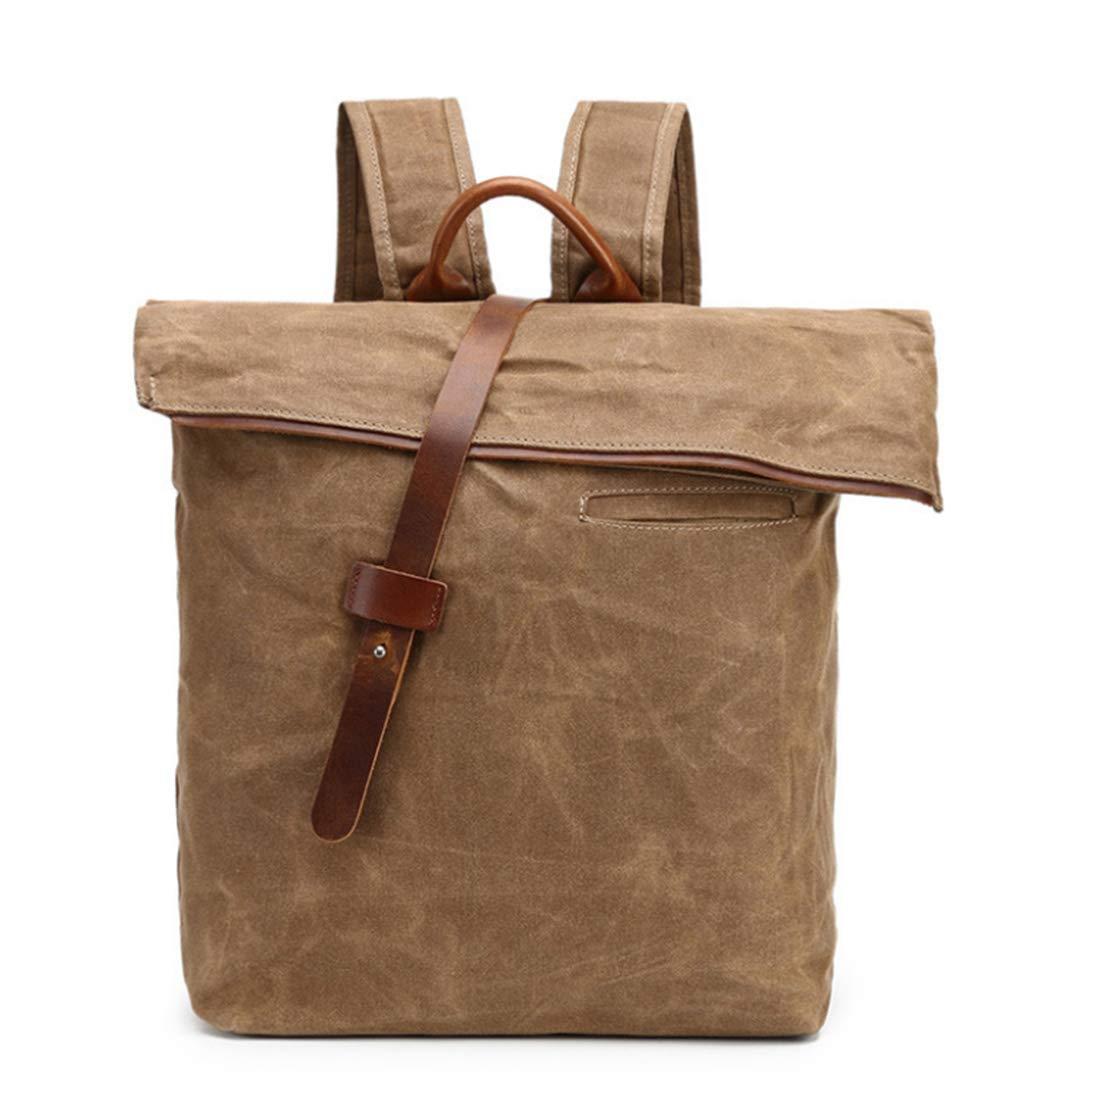 Color : Coffee Color Carriemeow Batik Cloth Leisure Shoulder Crazy Horse Leather Travel Backpack Waterproof Canvas Shoulder Bag